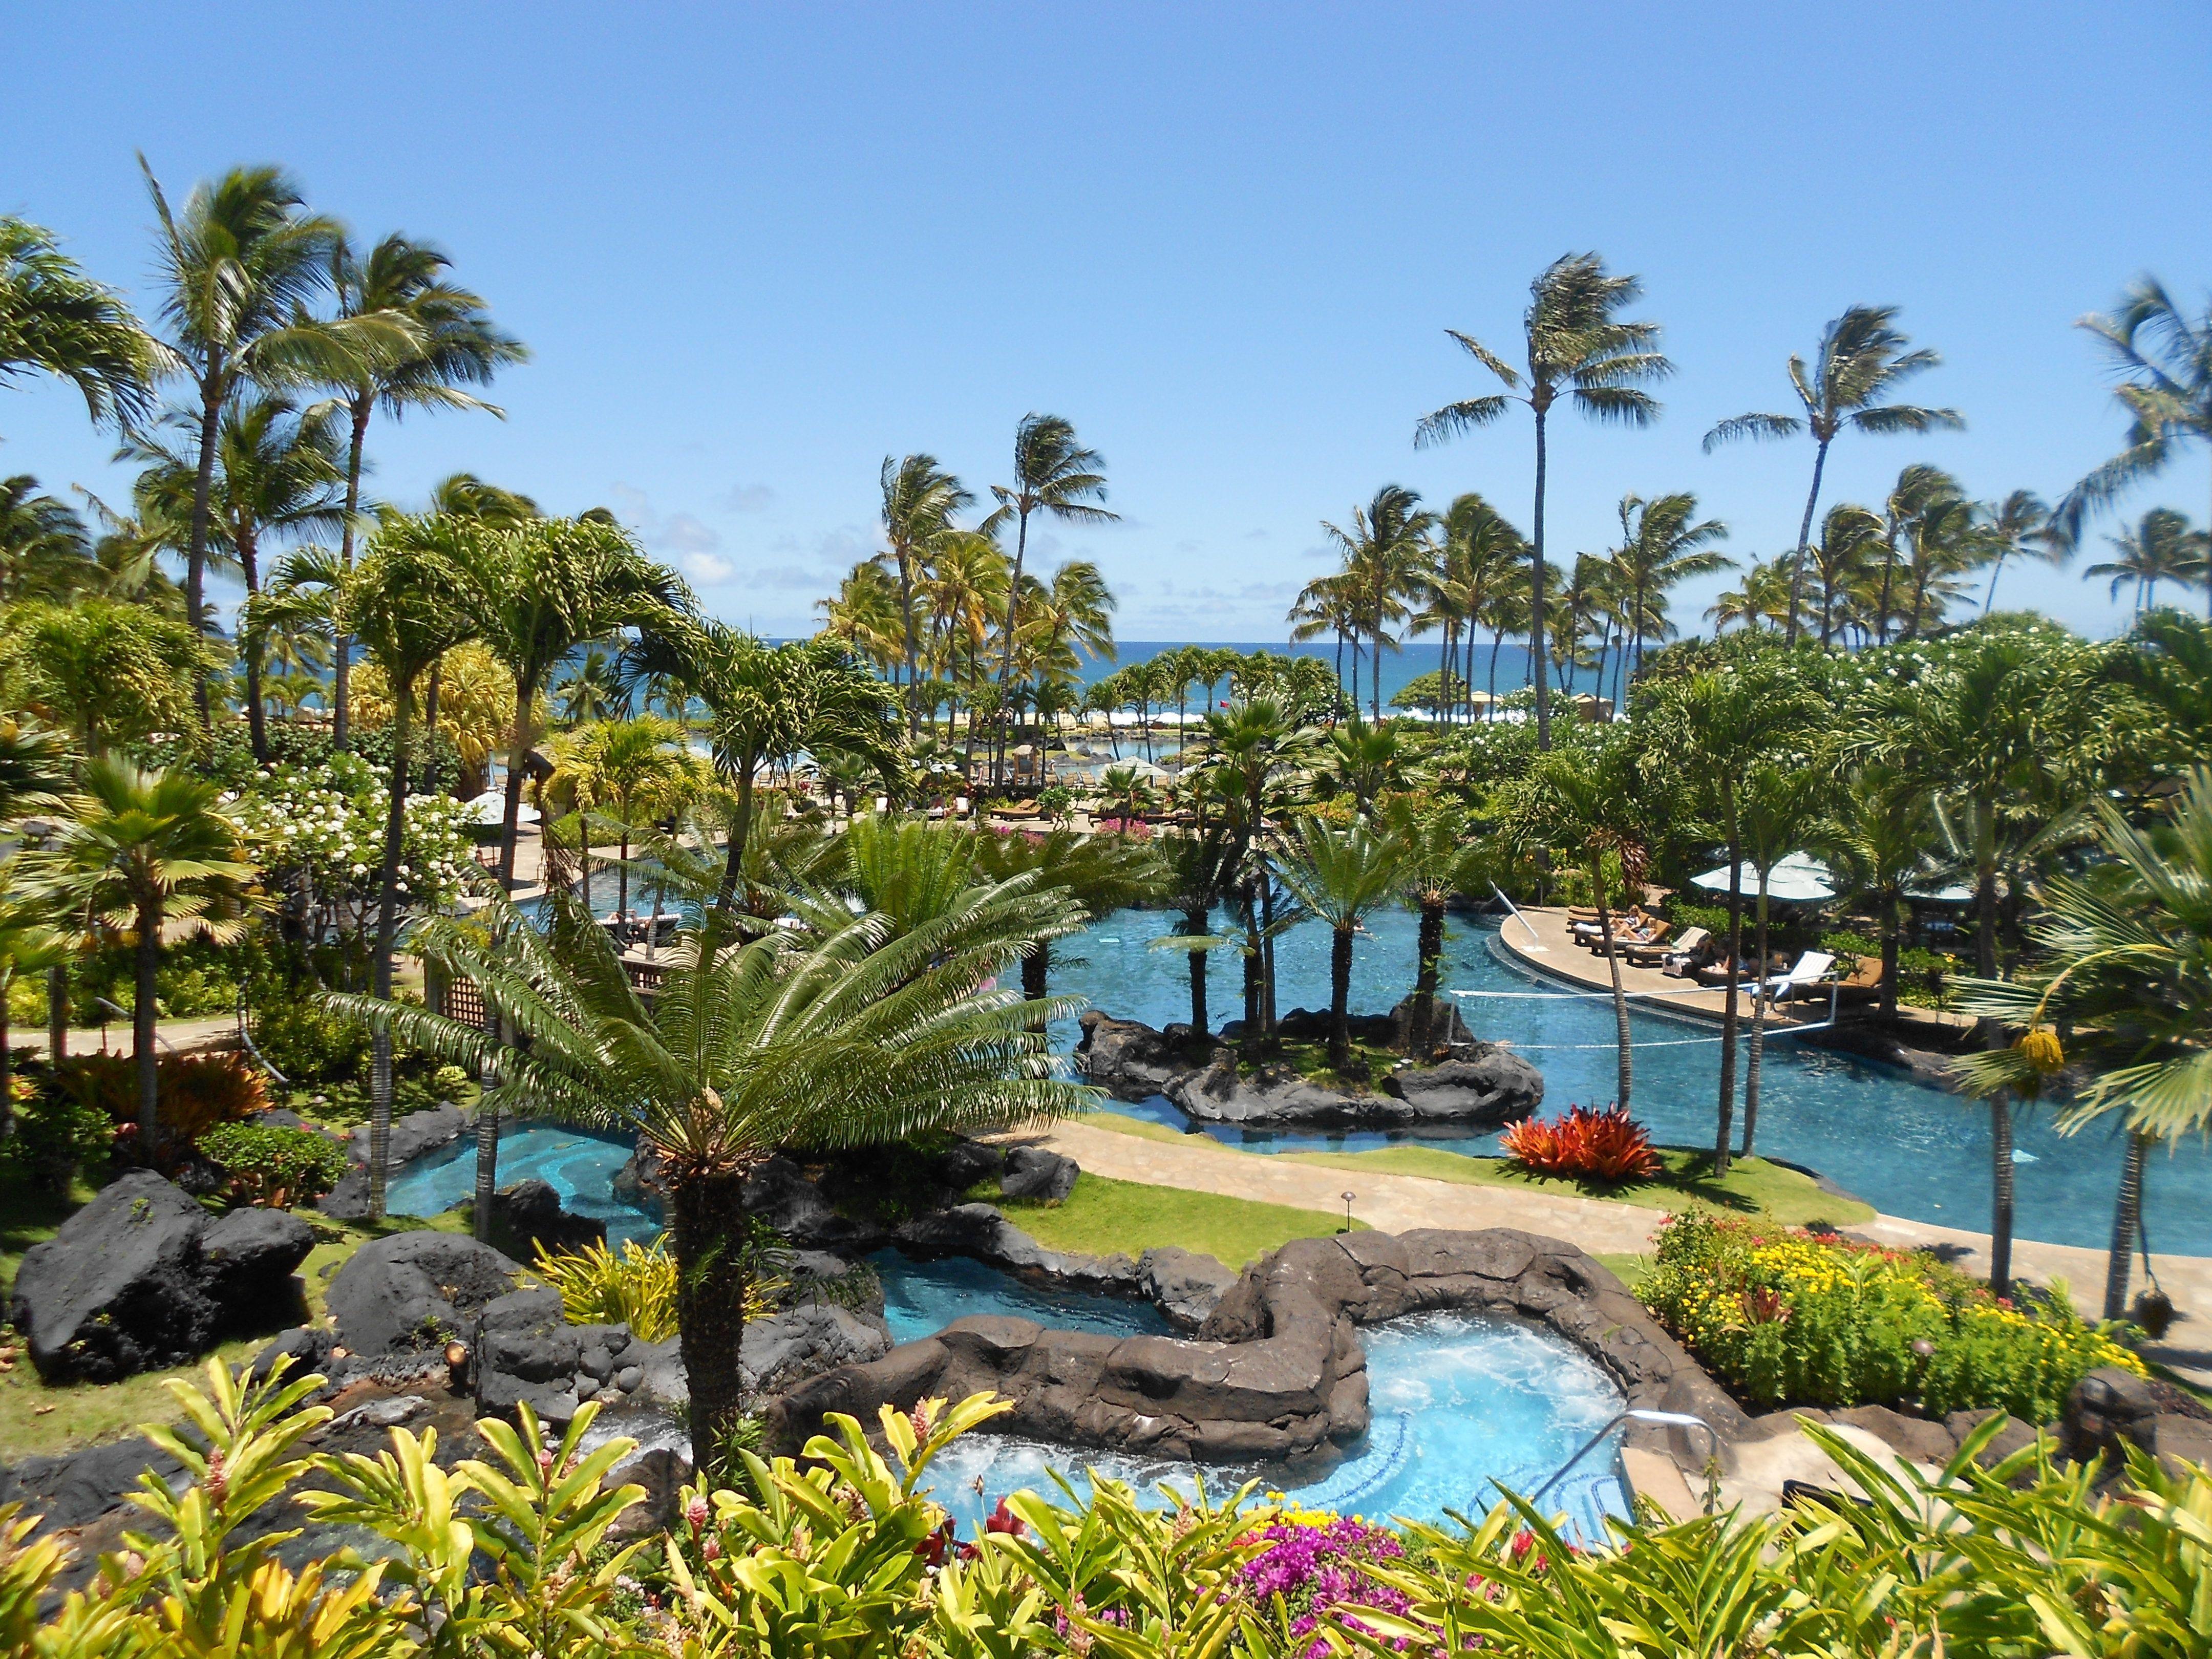 Resorts In Kauai Beach Resort The Grand Hyatt Poipu On Island Of Offers 6 Restaurants Lounges 24 Hr Room Service 2 Pools